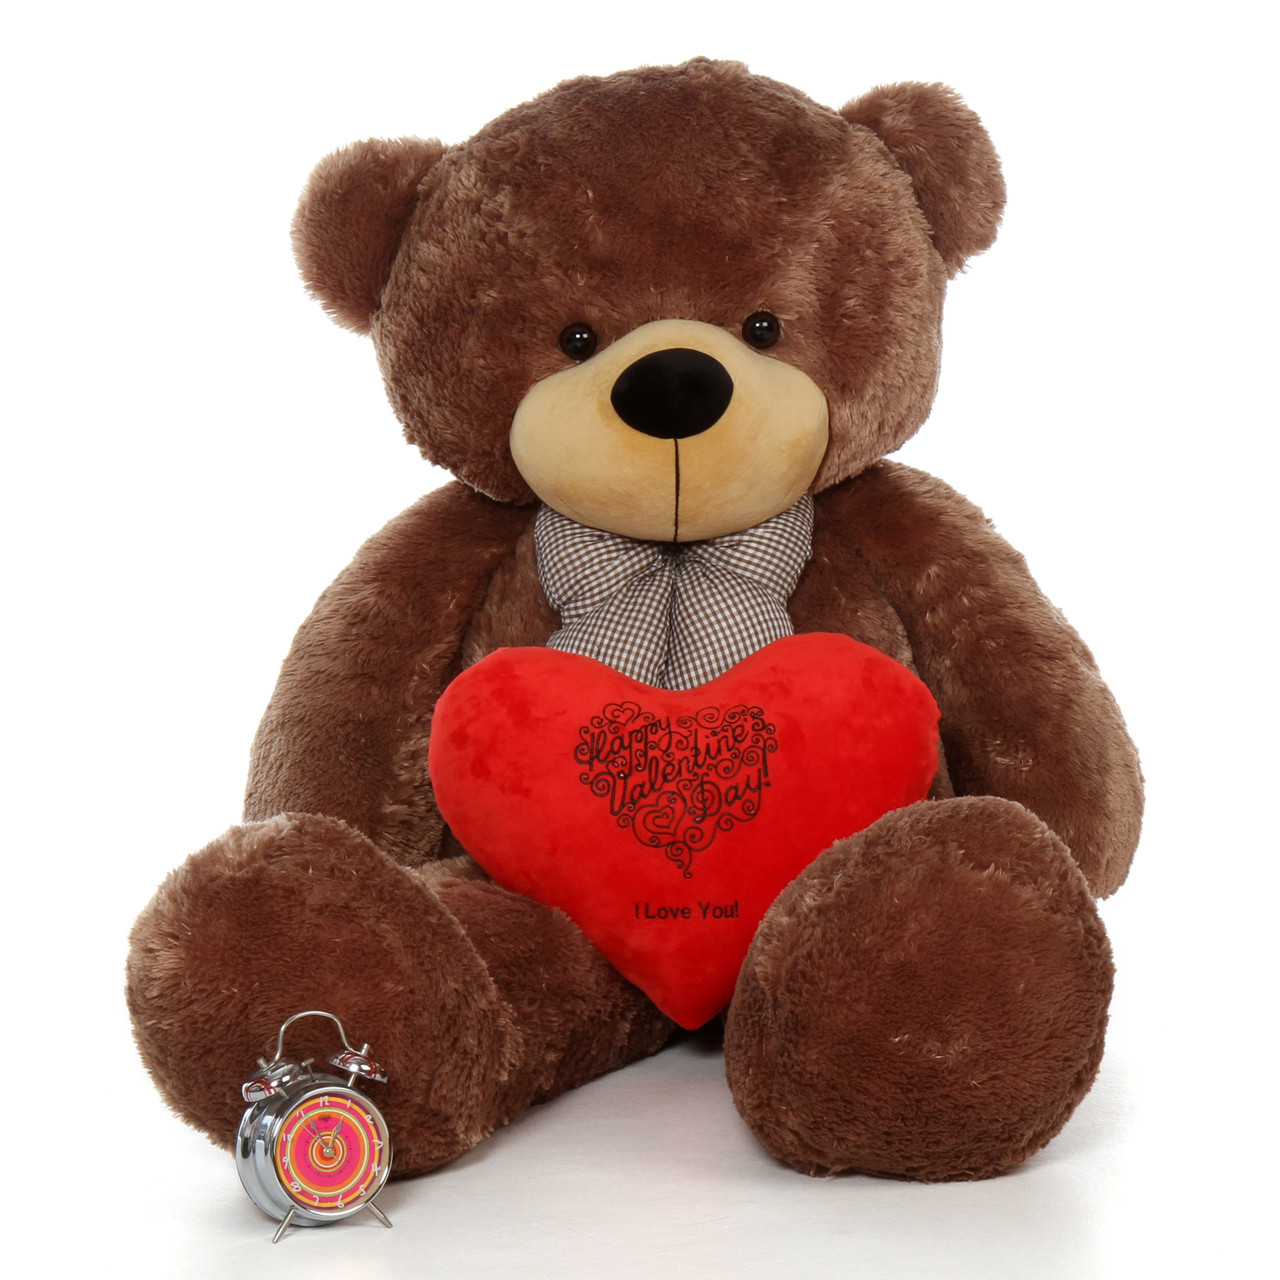 60in Happy Valentine's Day I Love You Teddy Bear Sunny